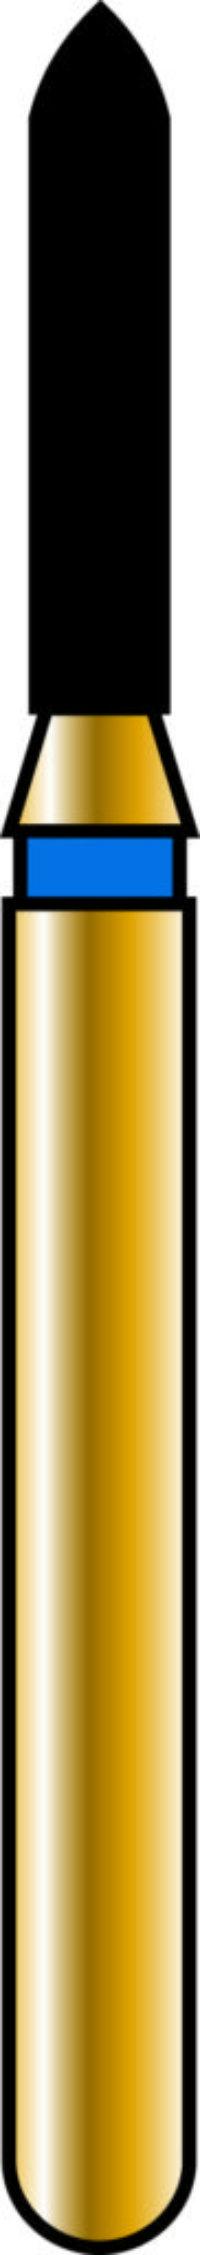 Pointed Cylinder 12-6mm Gold Diamond Bur - Coarse Grit